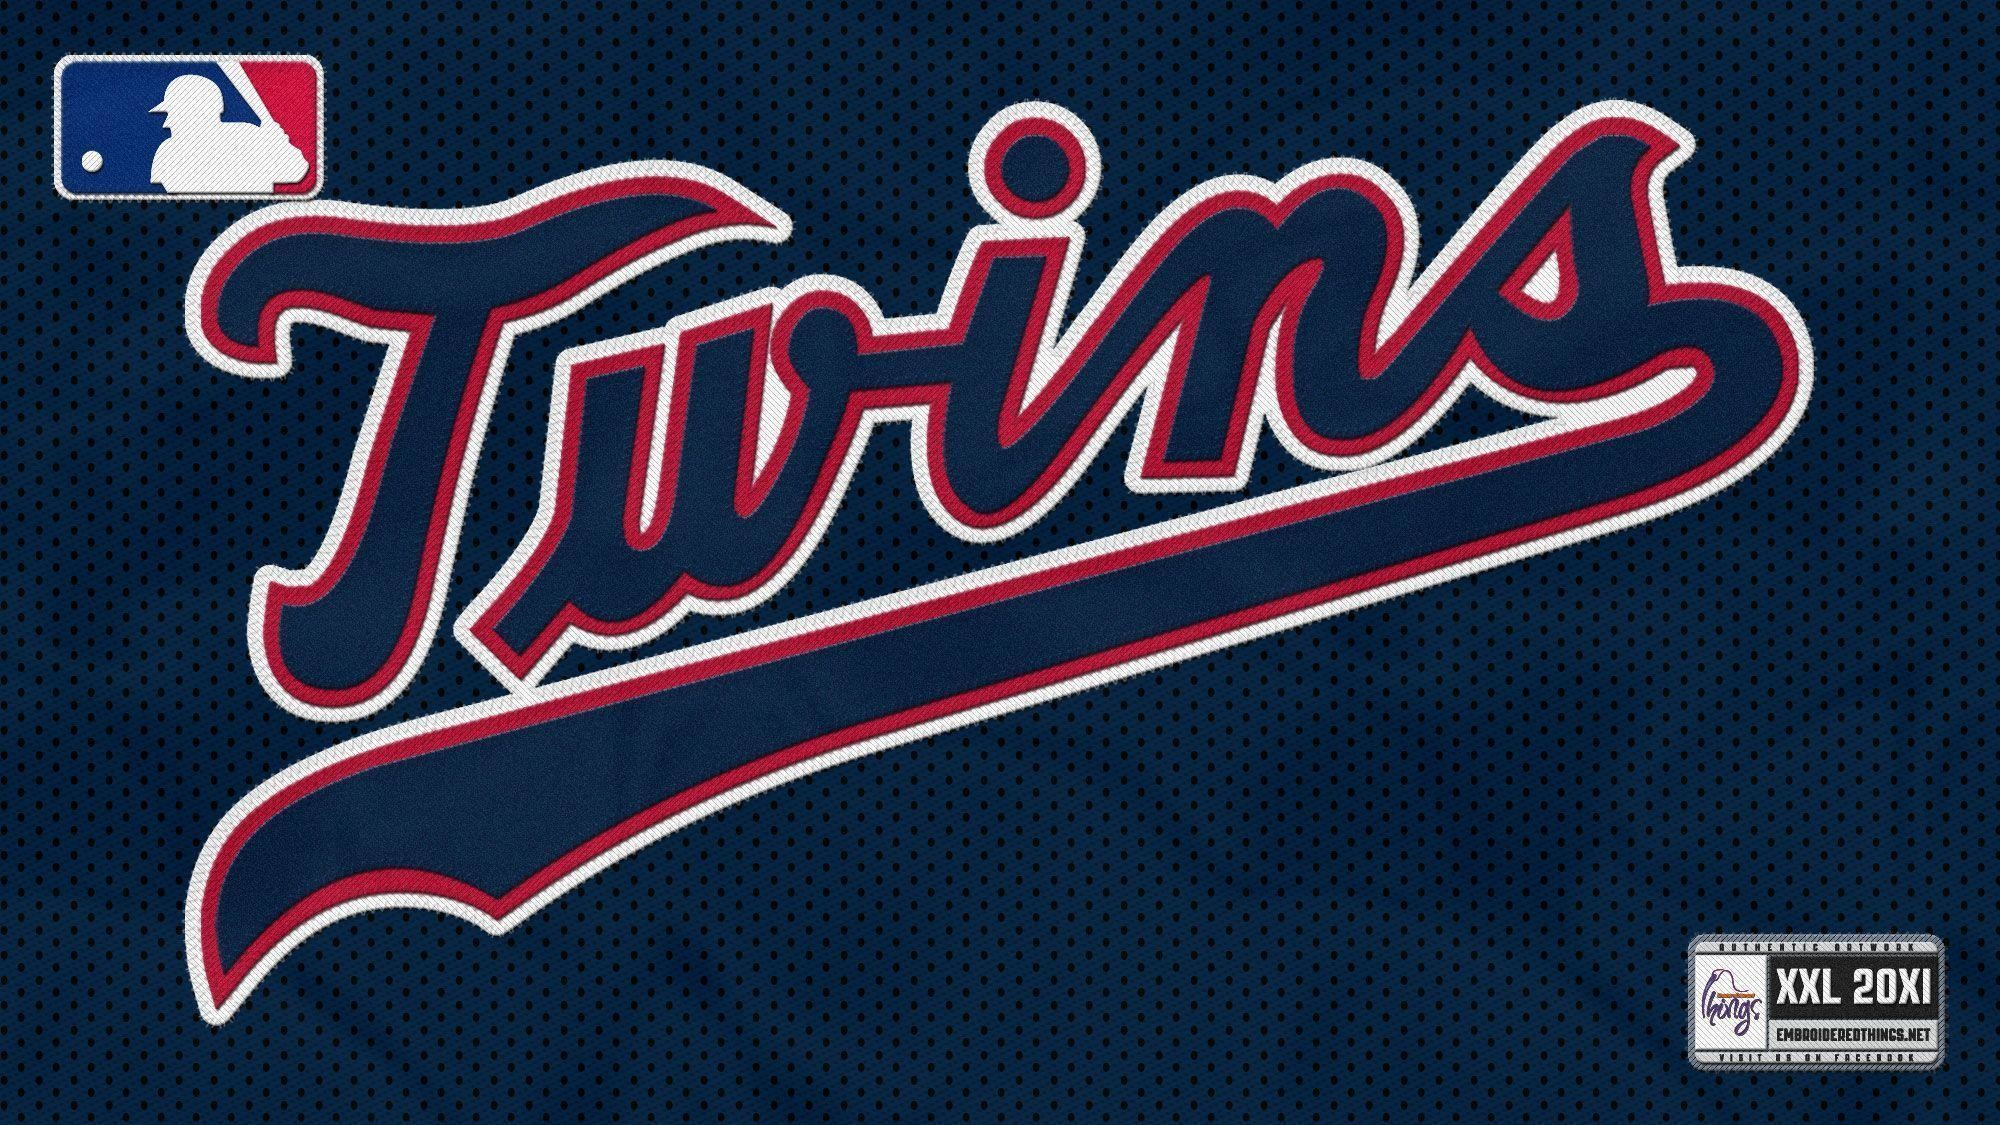 Minnesota Twins Wallpaper 3 #4740 HD MLB Wallpaper Res: .